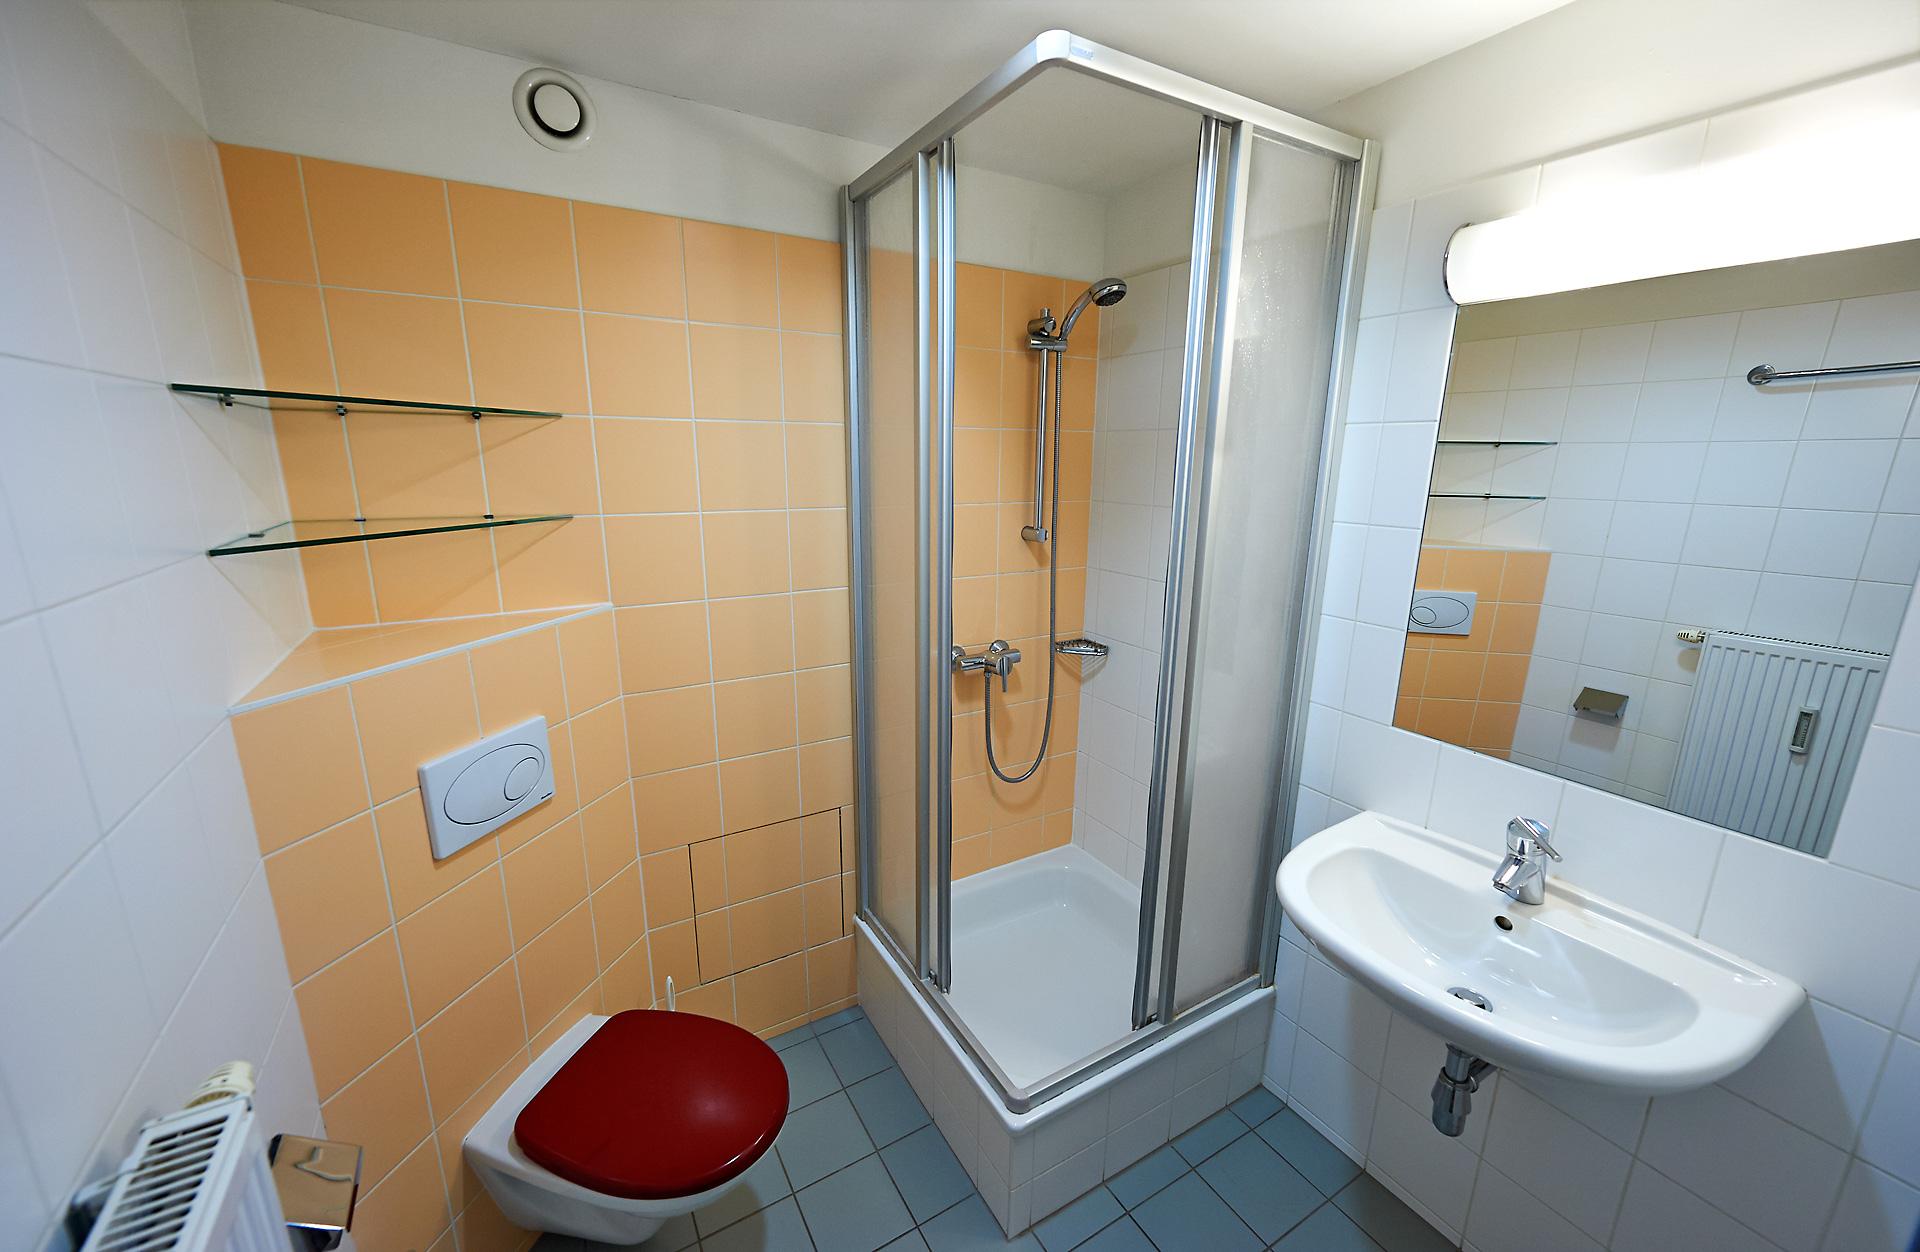 Studentenwohnheim Wien - Studentenzimmer in Top Lage | Kolping Wien